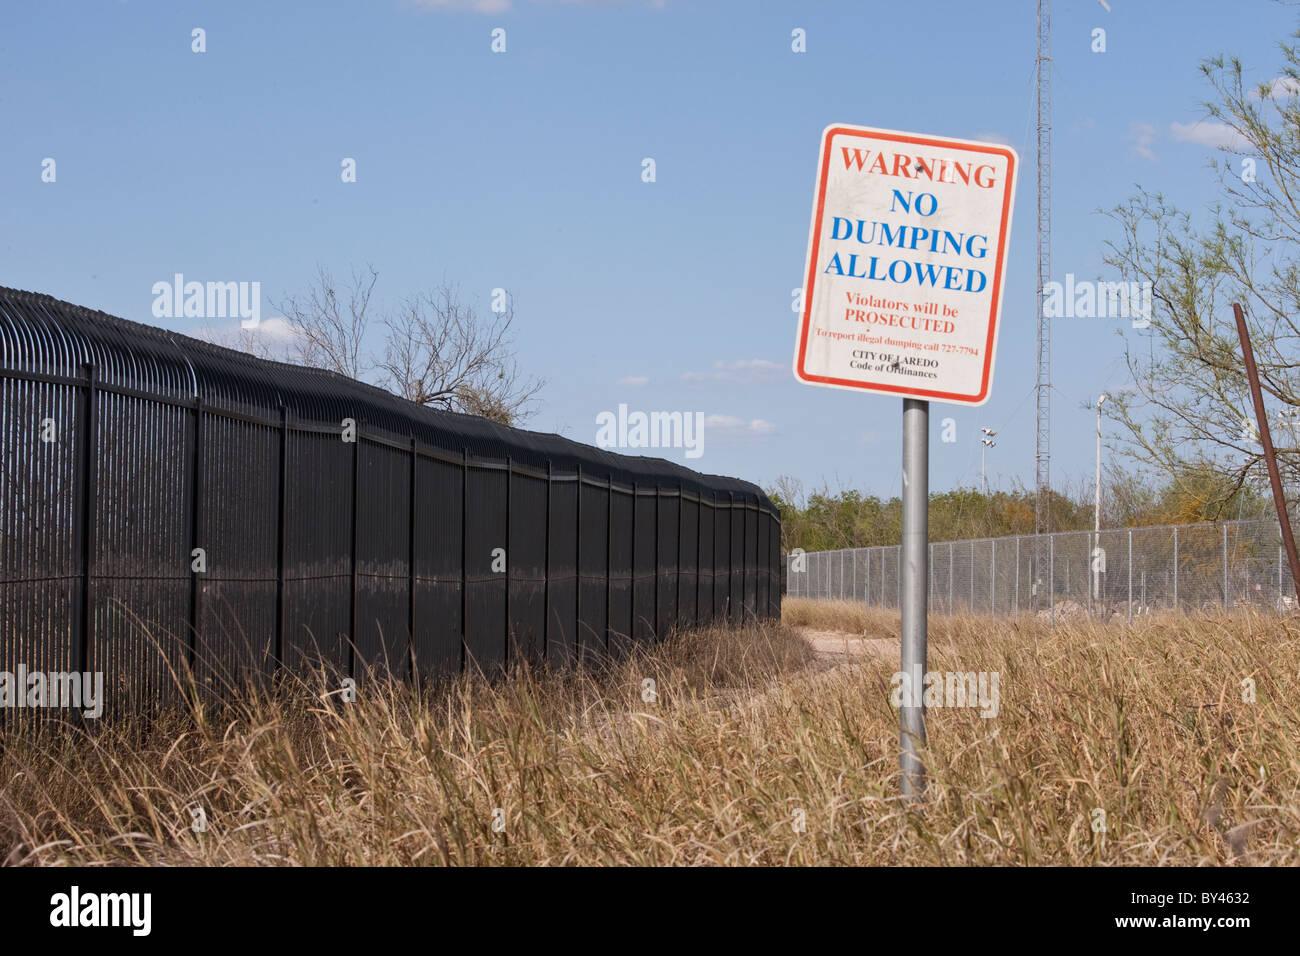 'No Dumping Allowed' sign near the Rio Grande riverbank in Laredo, Texas - Stock Image